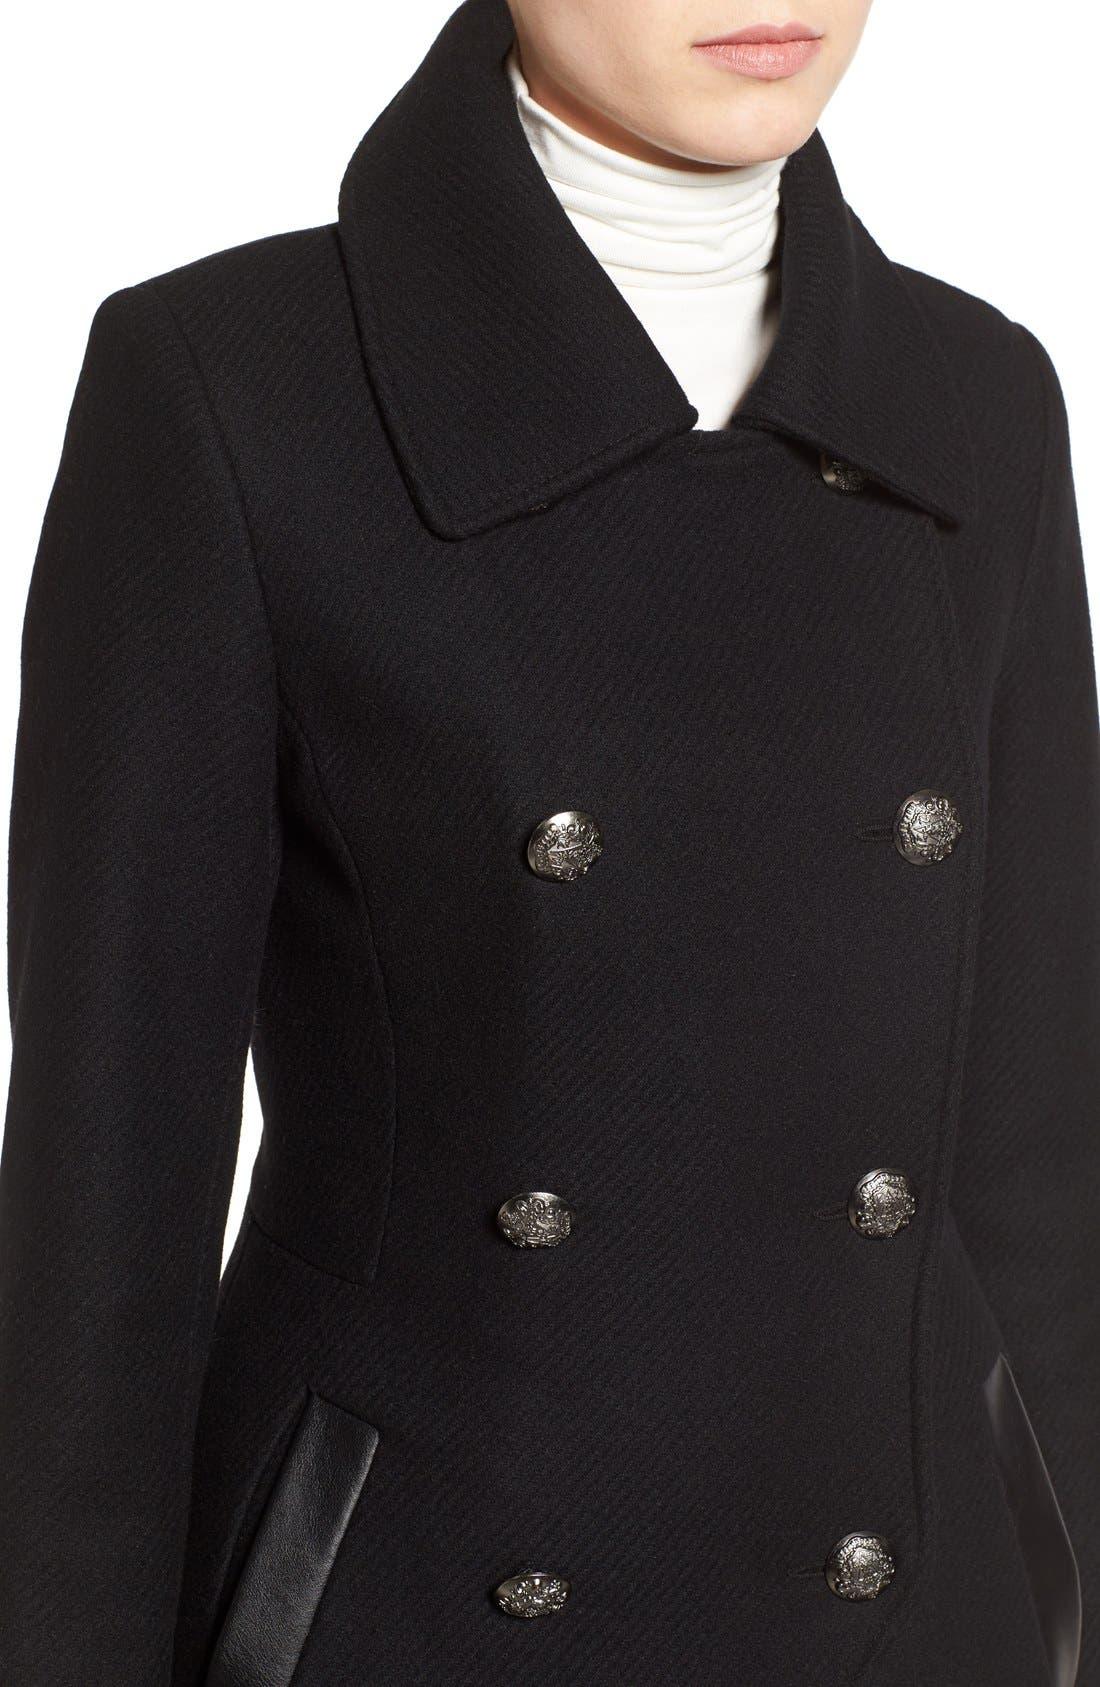 Alternate Image 4  - Trina Turk Wool Blend Military Coat (Regular & Petite)